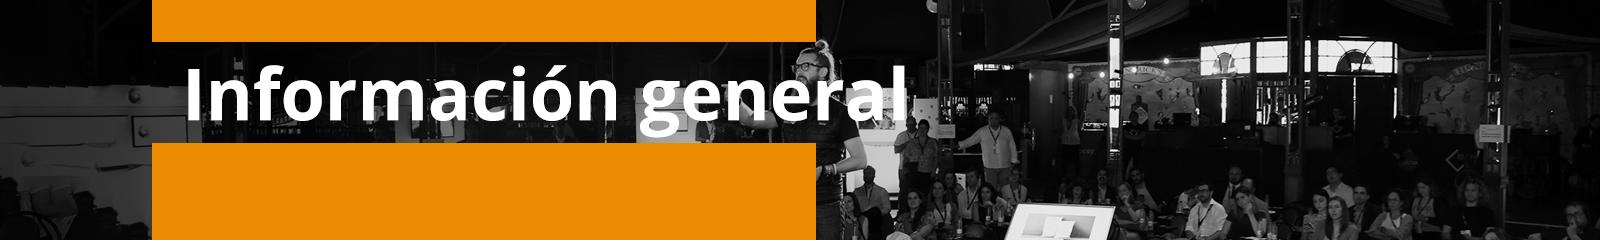 Información general Global Summit for Insurance Innovation 2020